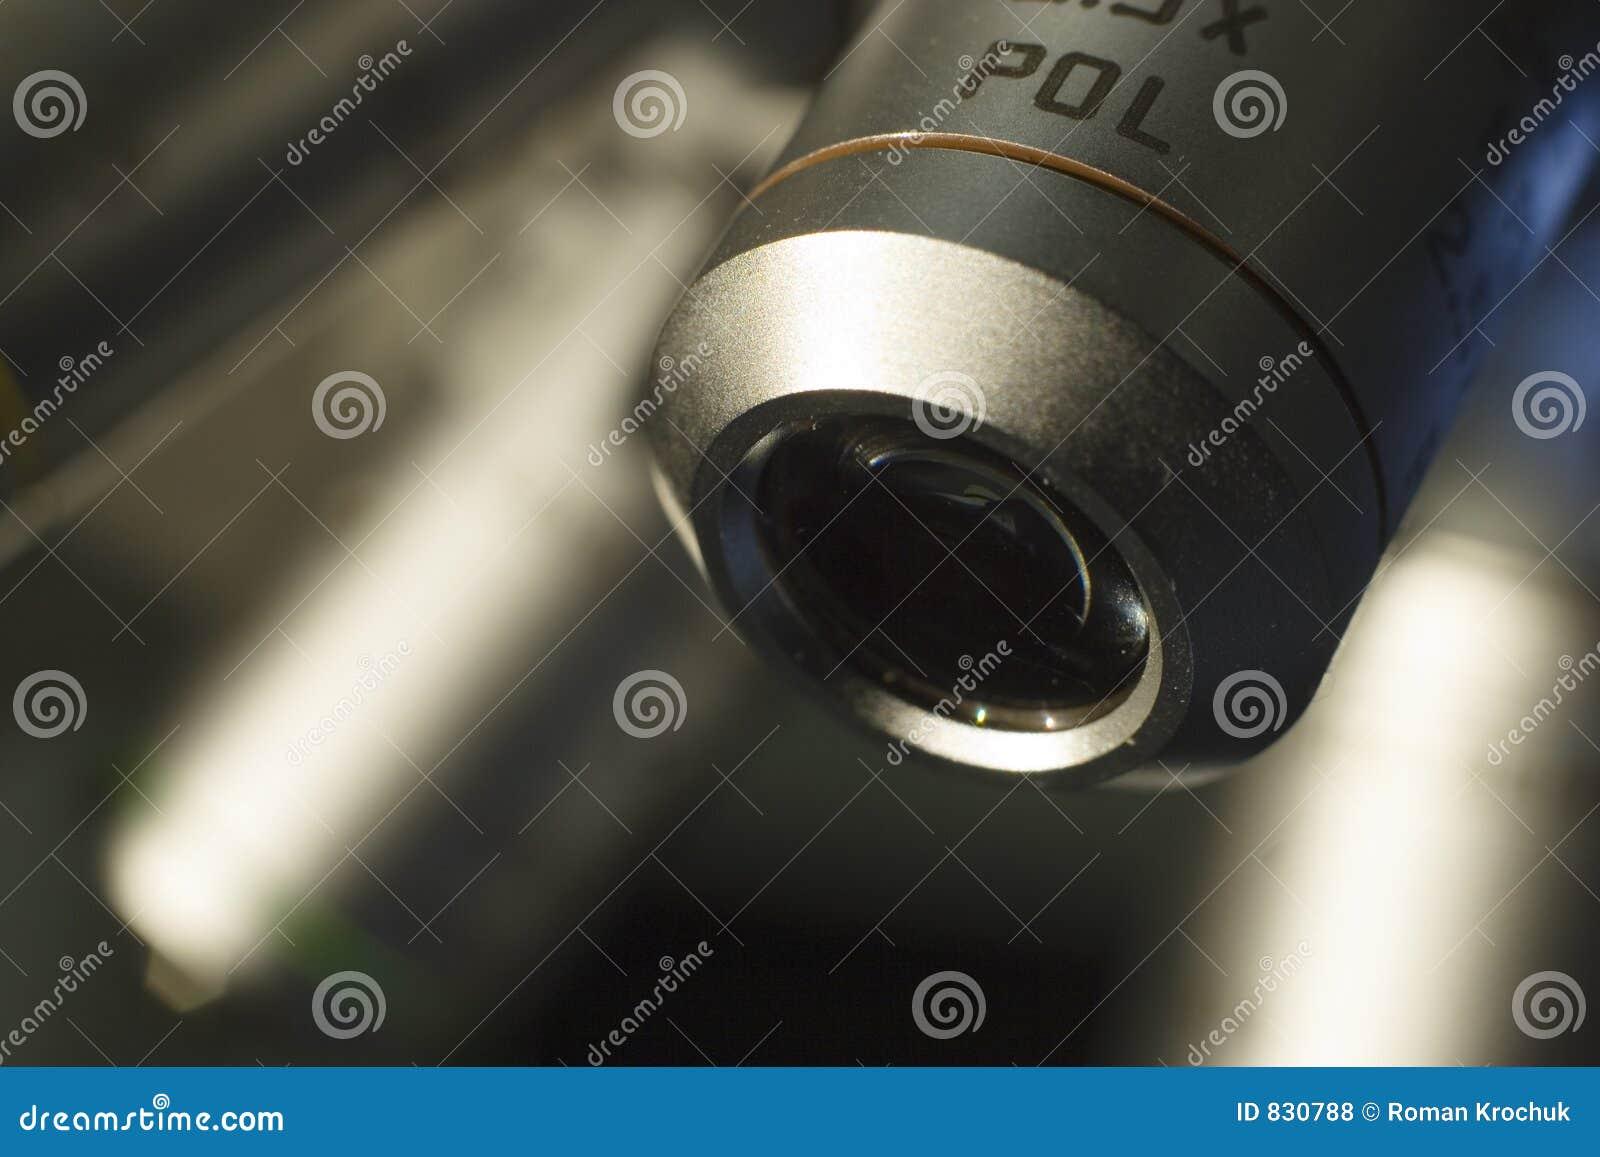 2x microscope lens